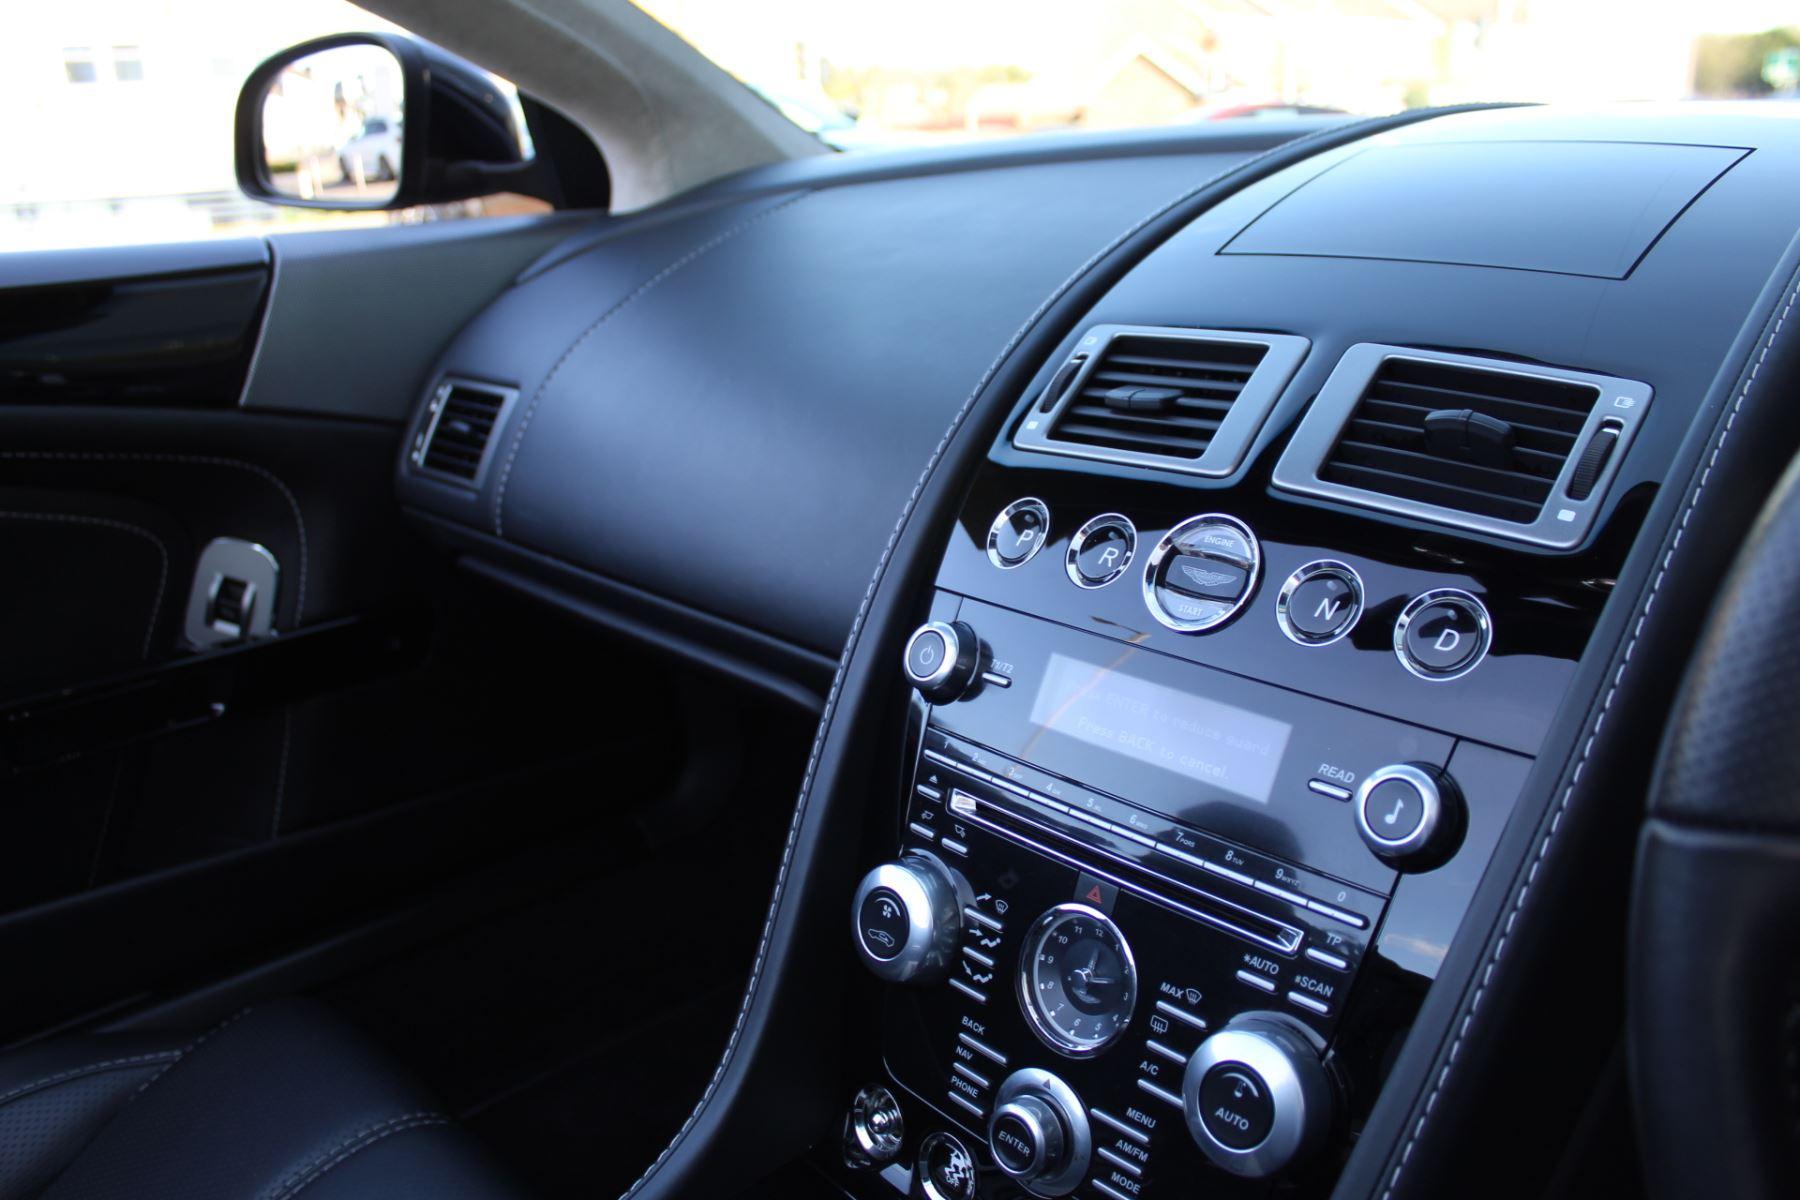 Aston Martin DB9 V12 2dr Volante Touchtronic [470] image 15